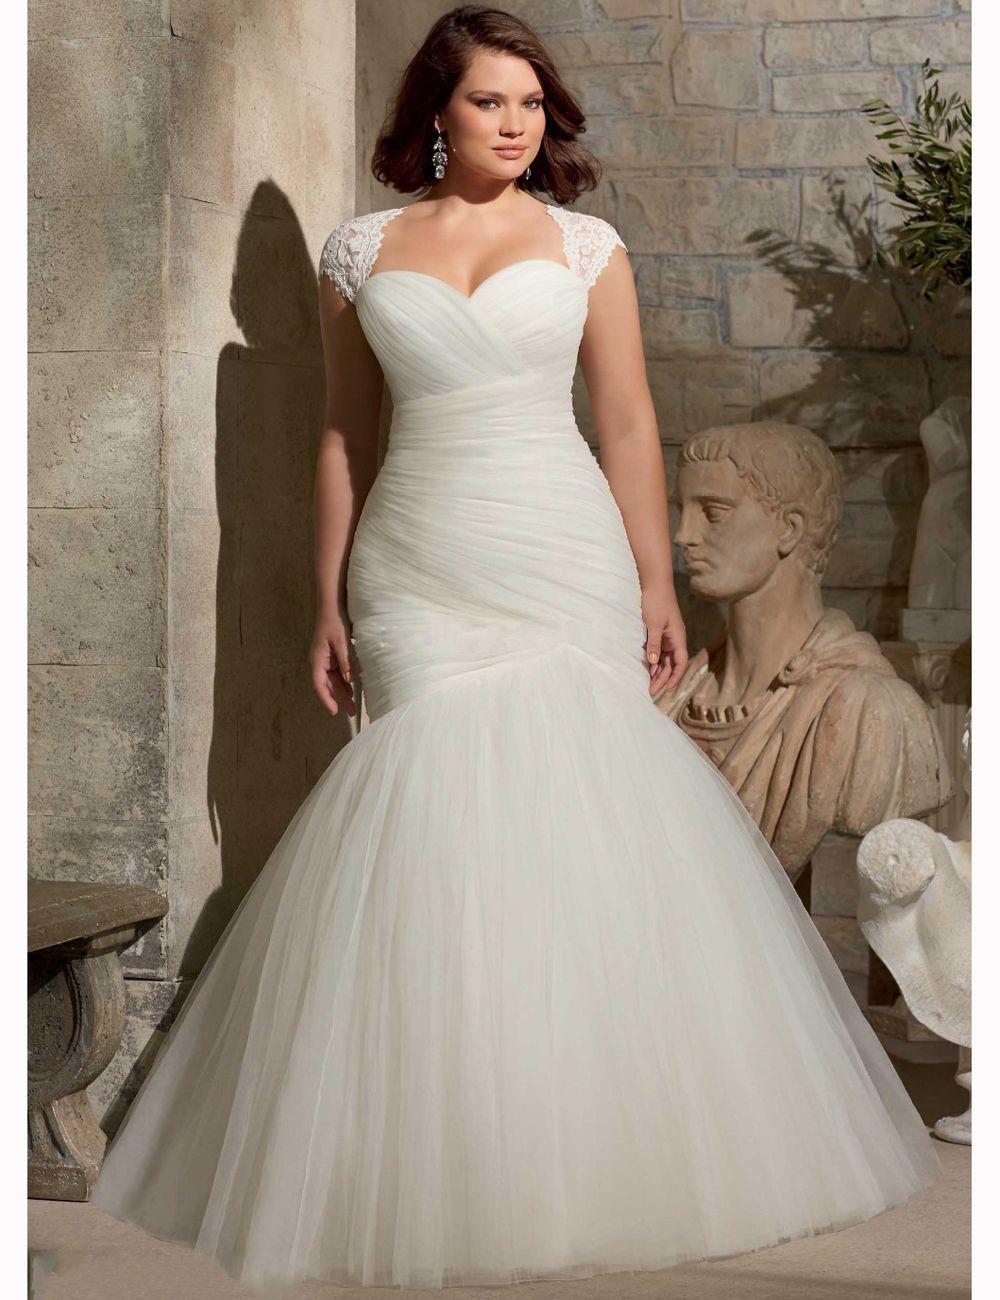 Http Fashiongarments Biz Products Cap Sleeves Corset Size 18 Wedding Dresstule